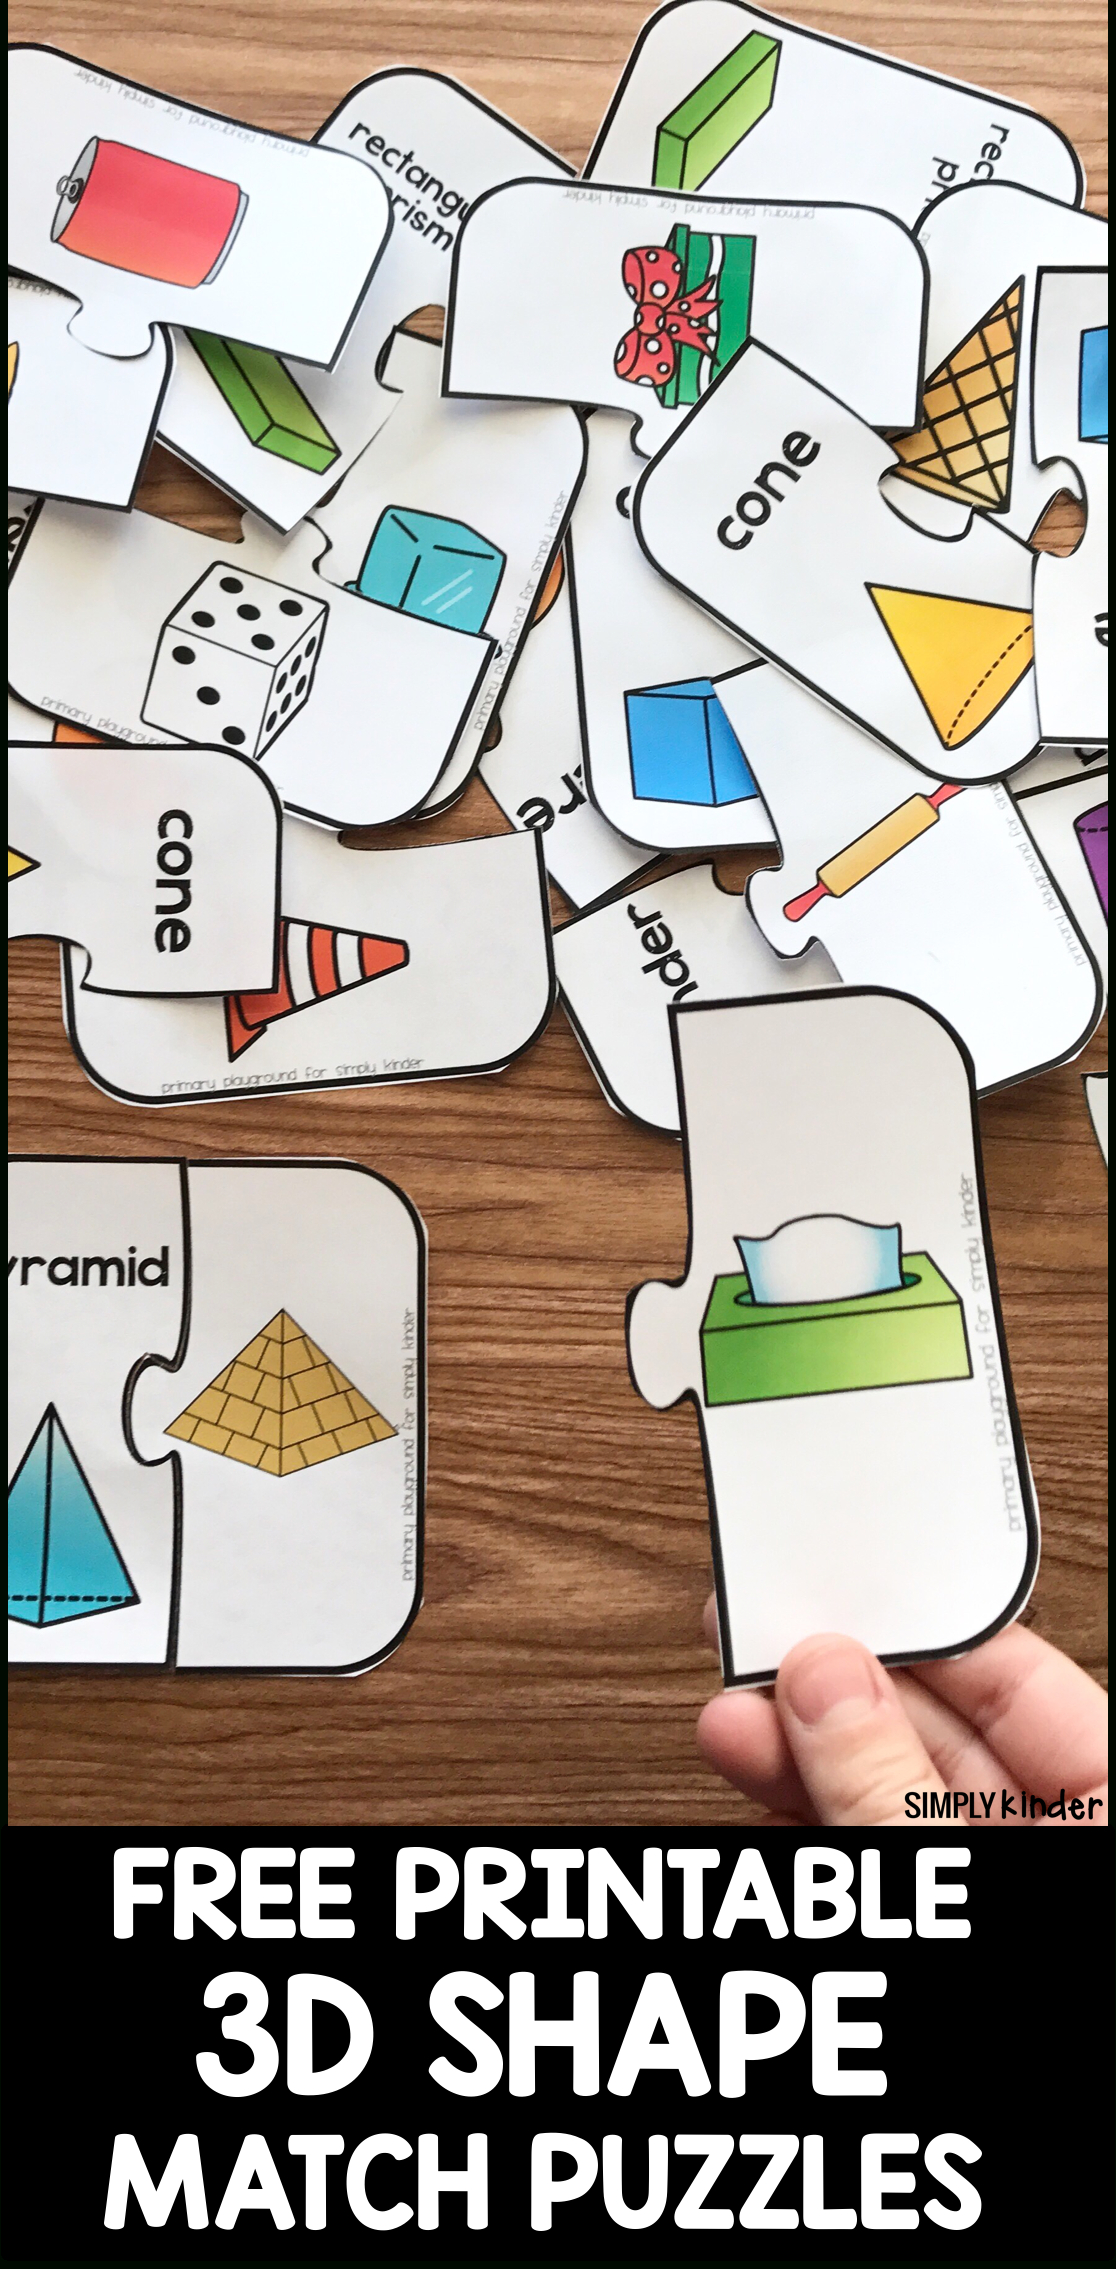 Free Printable 3D Shape Puzzles - Simply Kinder - Printable 3D Puzzle